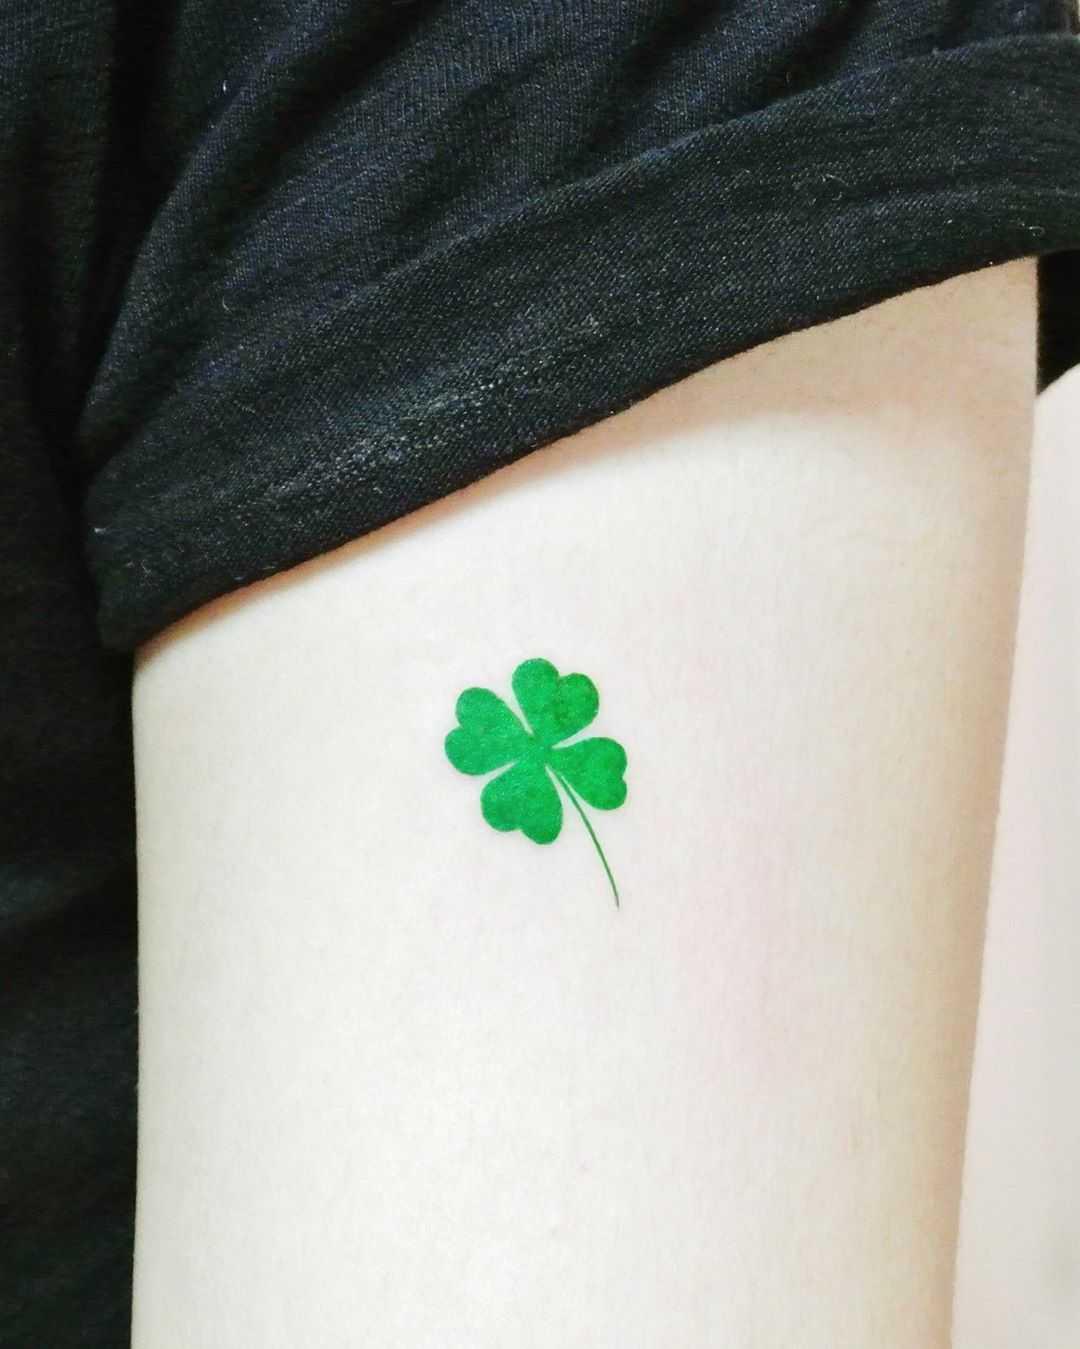 Four-leaf clover by tattooist Cozy